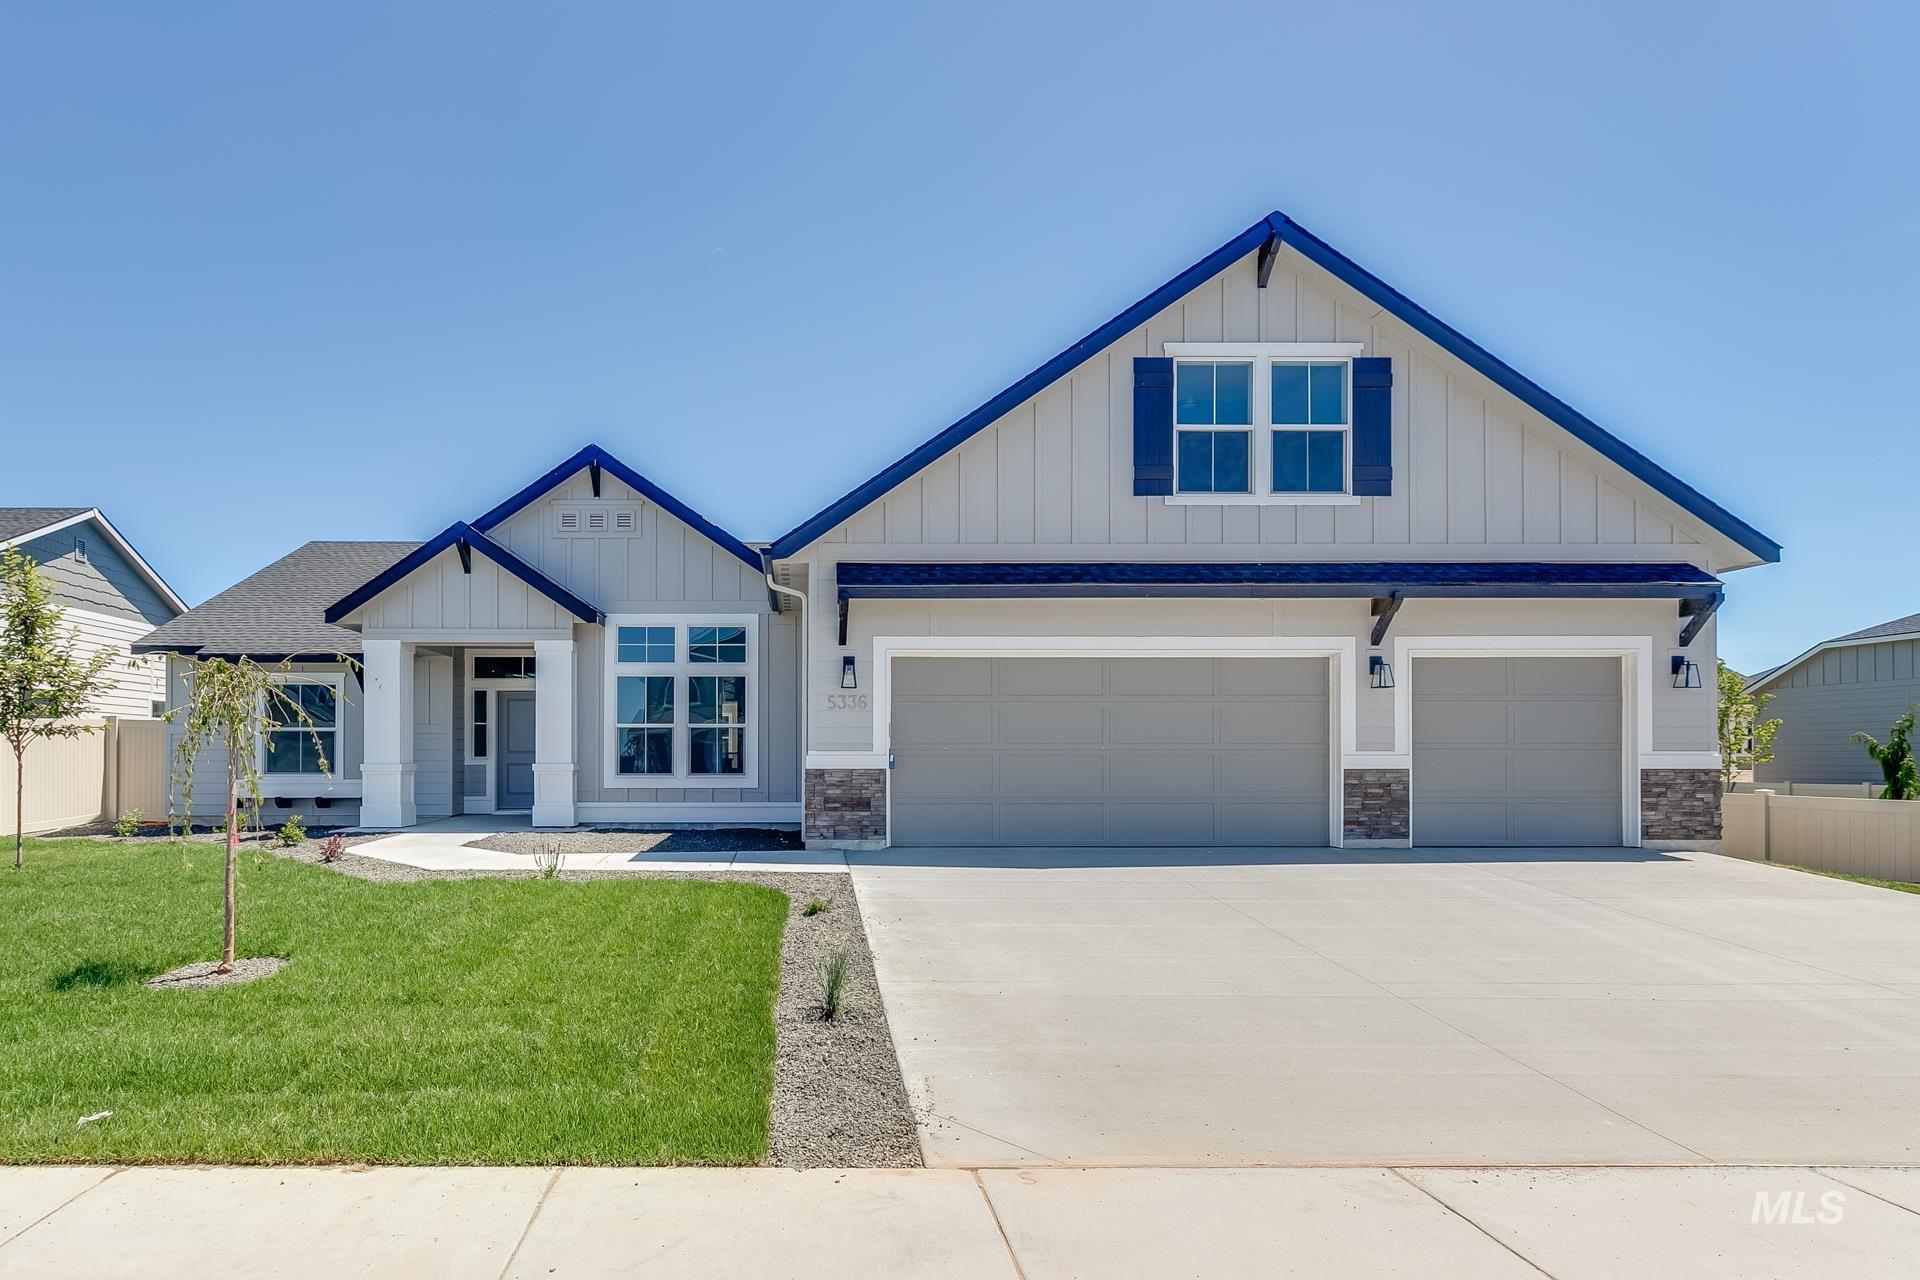 865 W Buttonbush Ct Property Photo